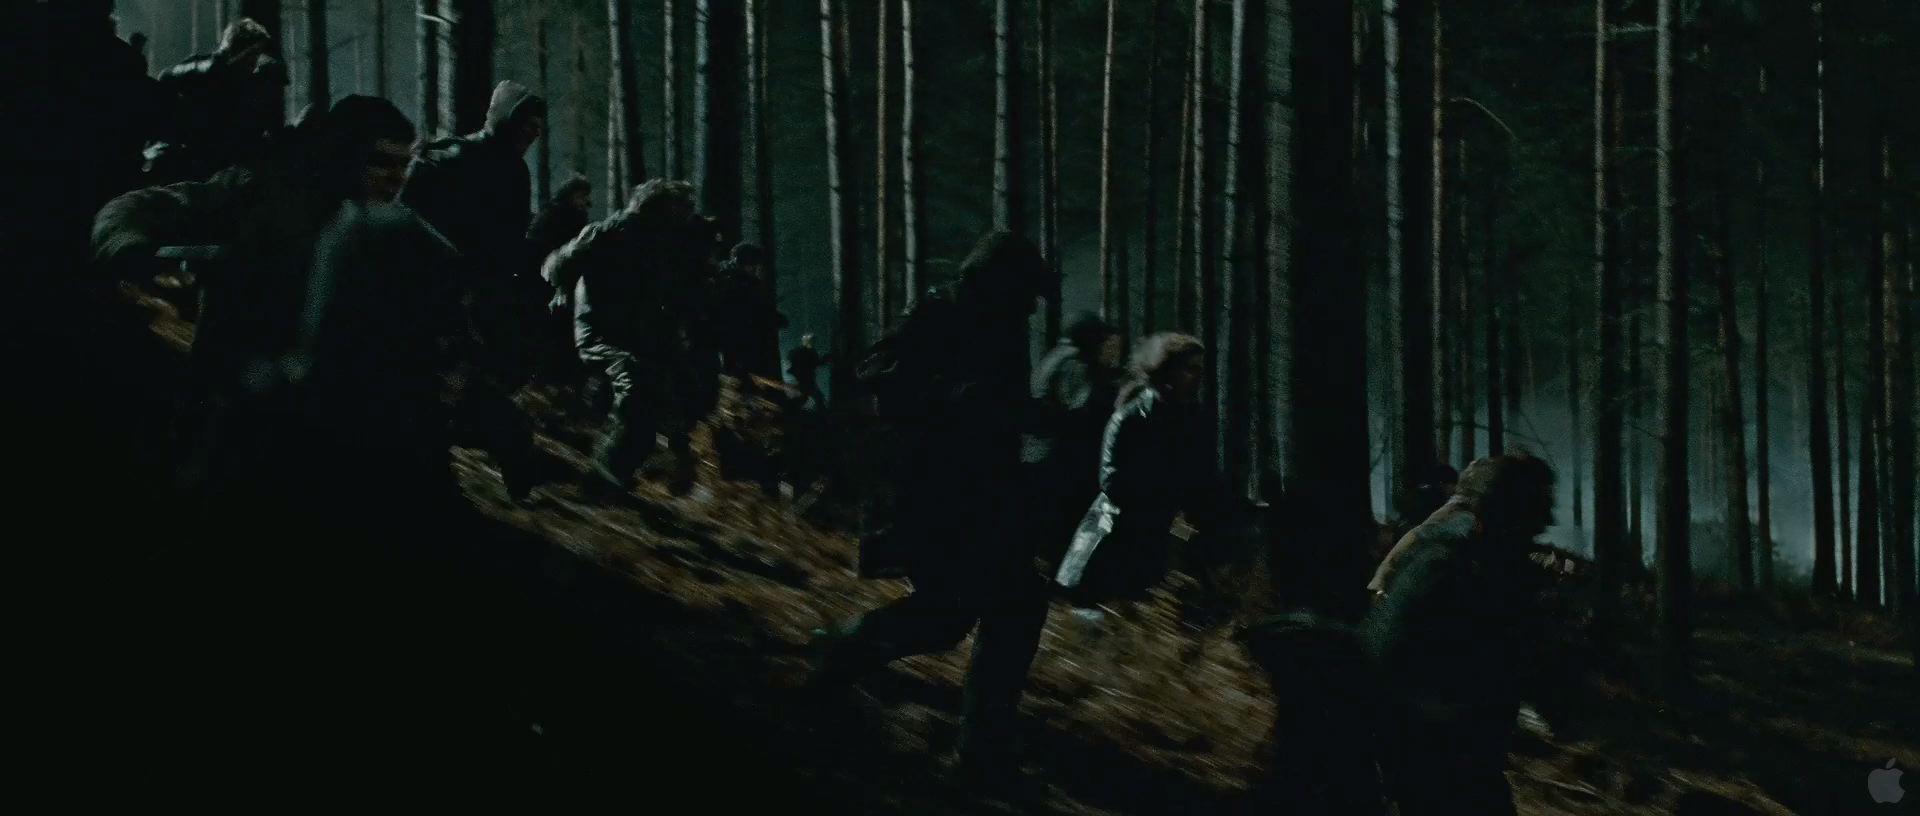 Harry Potter BlogHogwarts HP7 2 Trailer 62